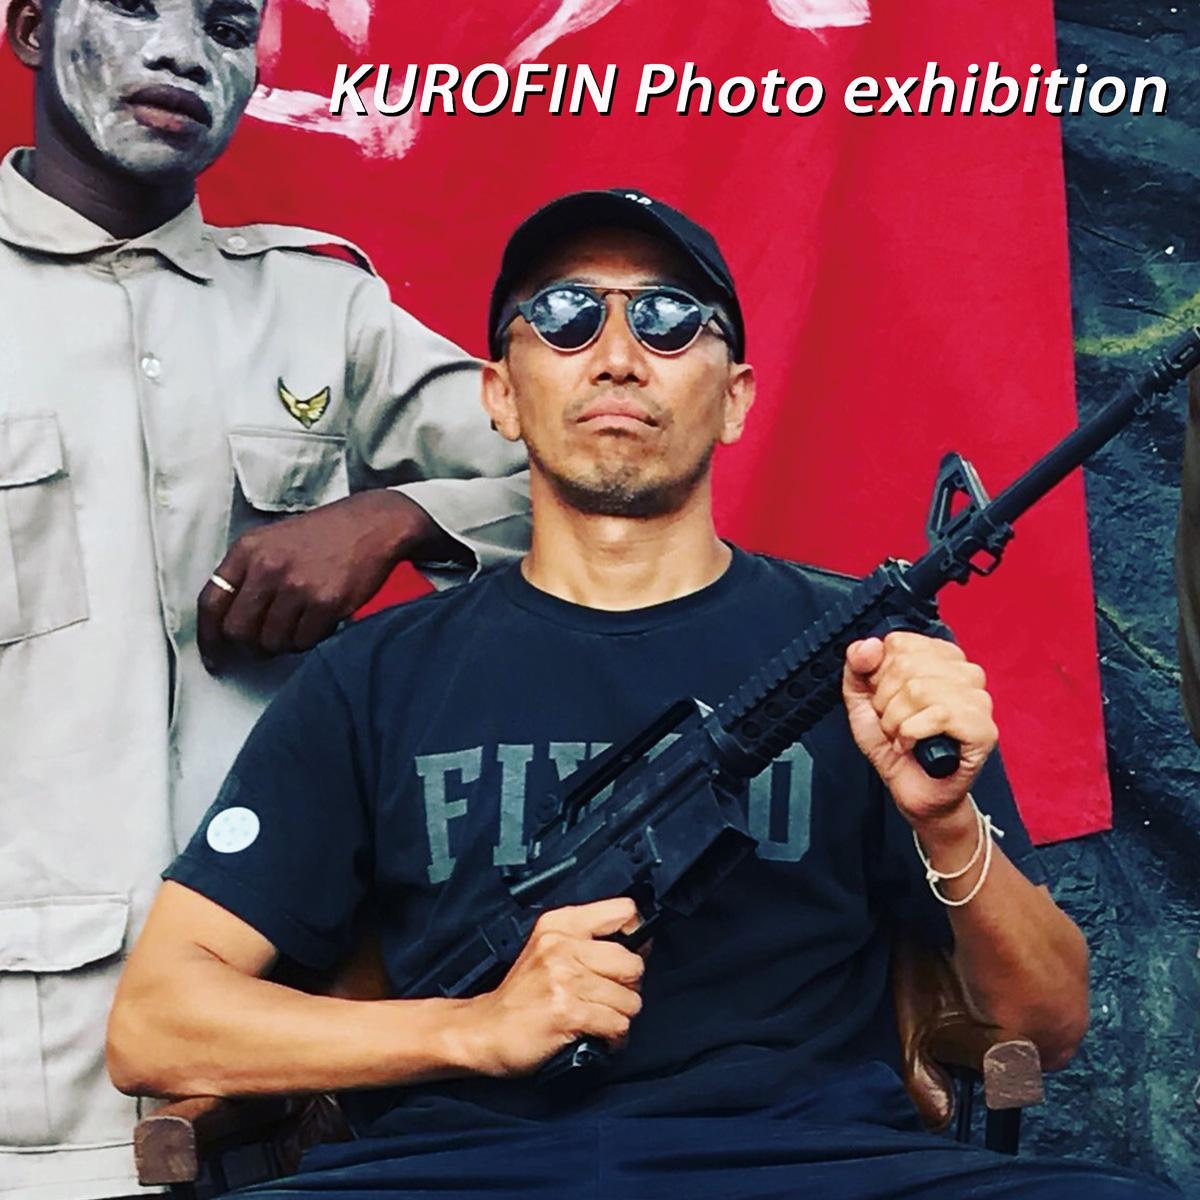 KUROFIN Photo exhibition